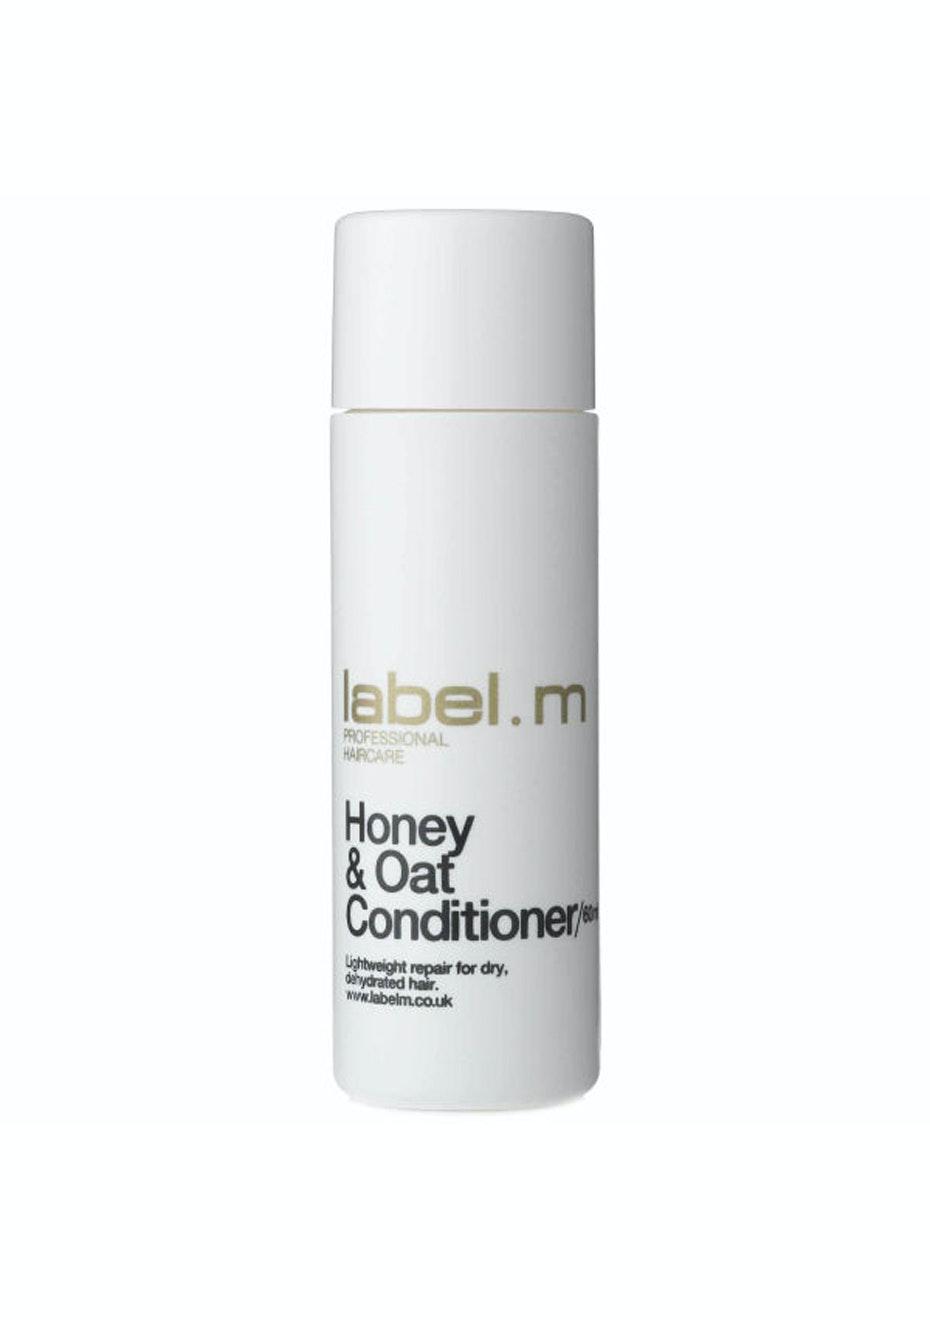 label.m - Honey & Oat Conditioner 60ml